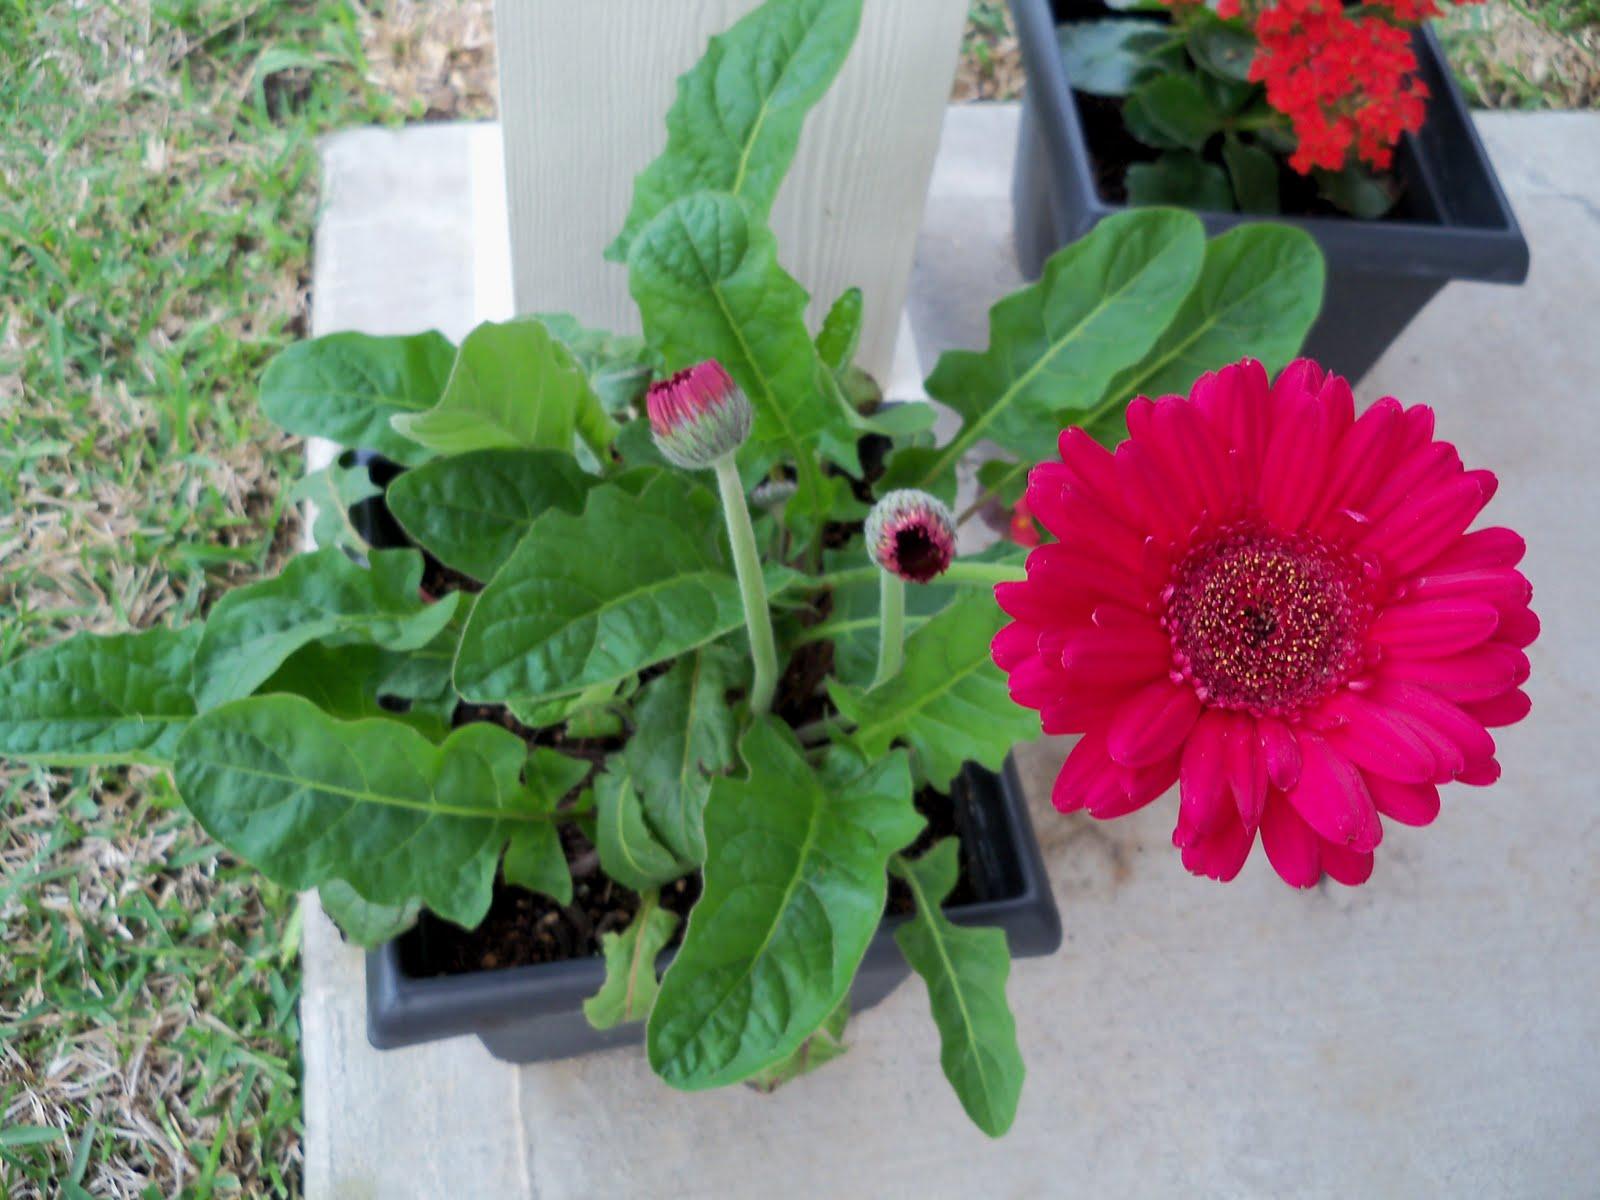 Gardening 2010 - 101_0887.JPG